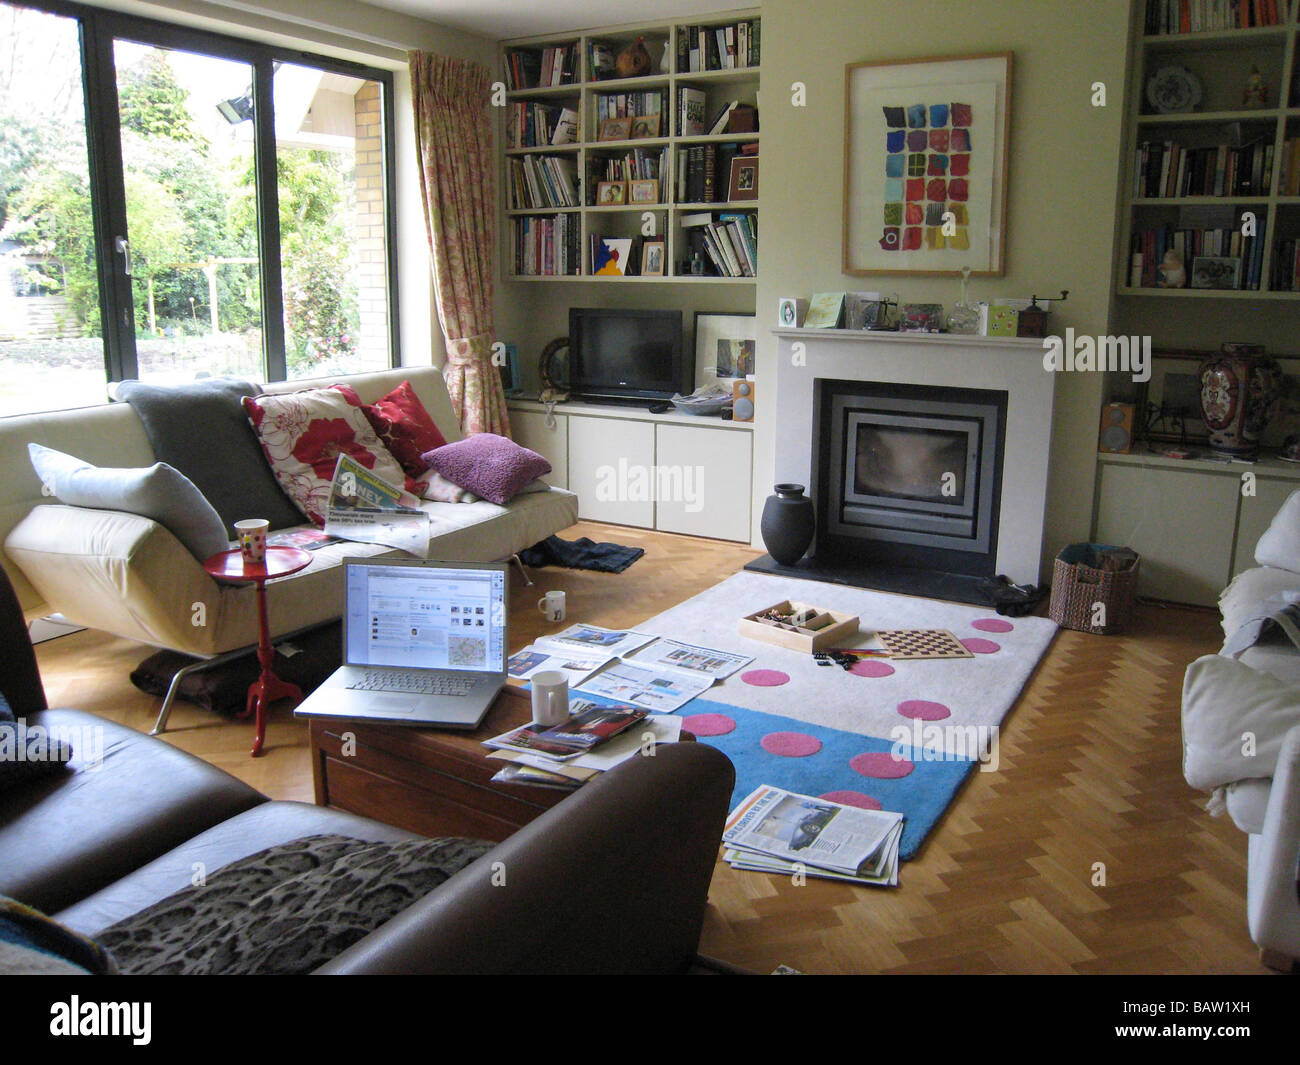 messy family living room Stock Photo 23907257 Alamy